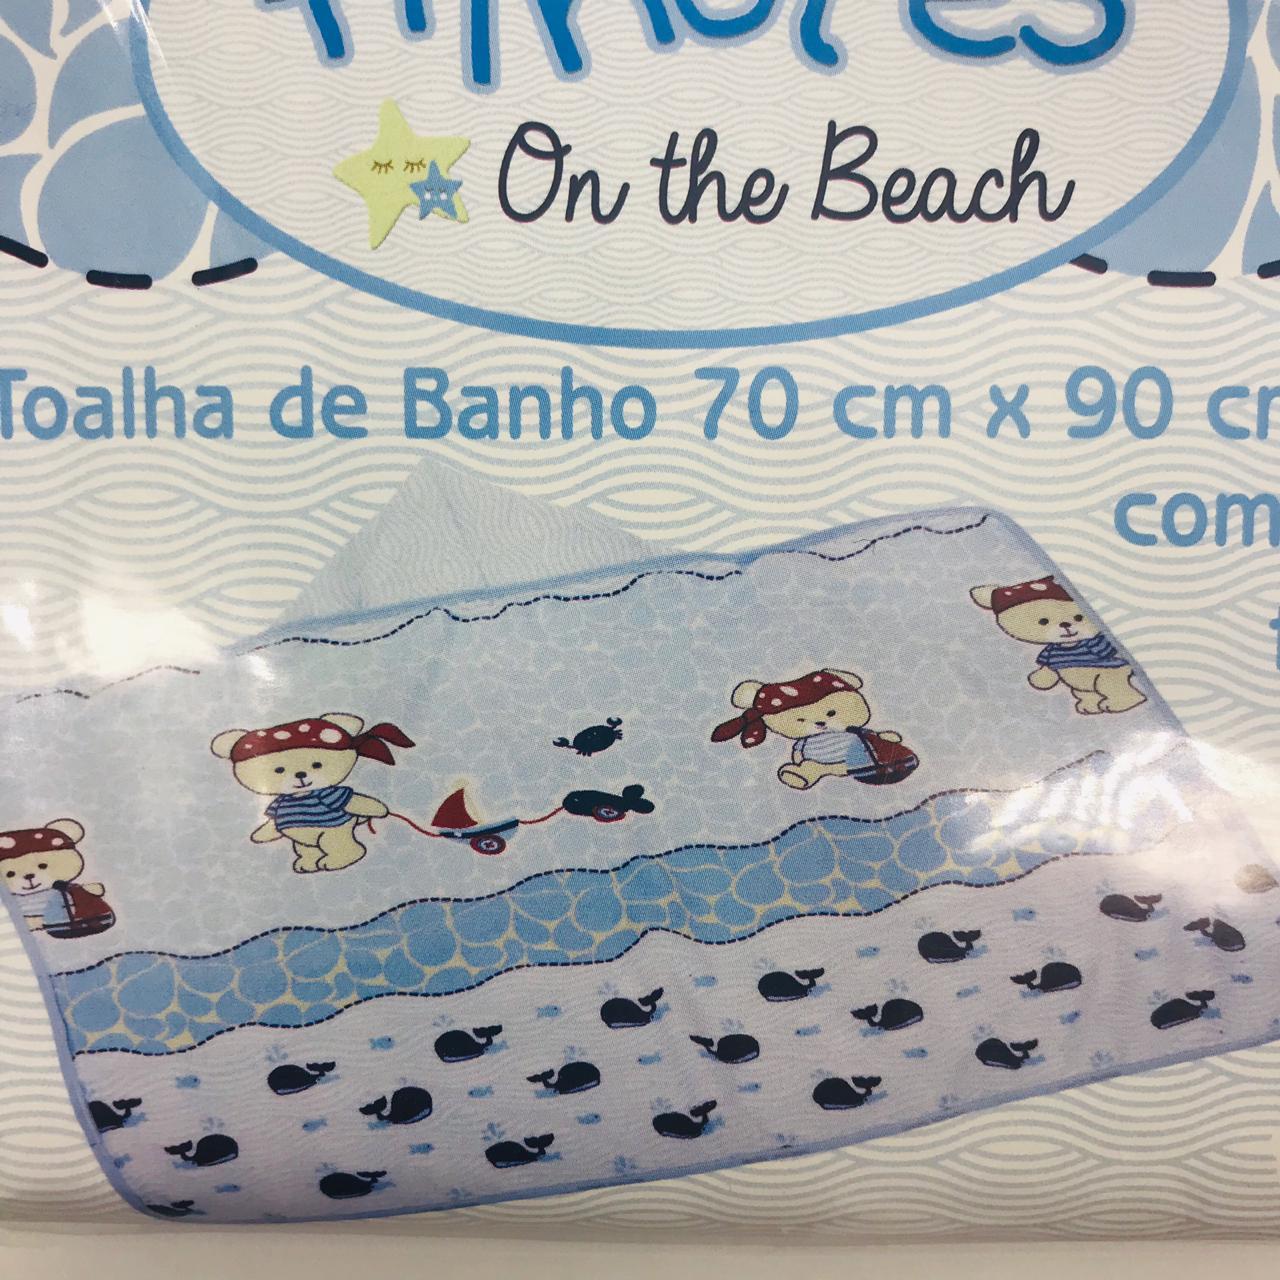 Toalha de Banho Forro Fralda Filhotes Baleia - Minasrey Ref 1979